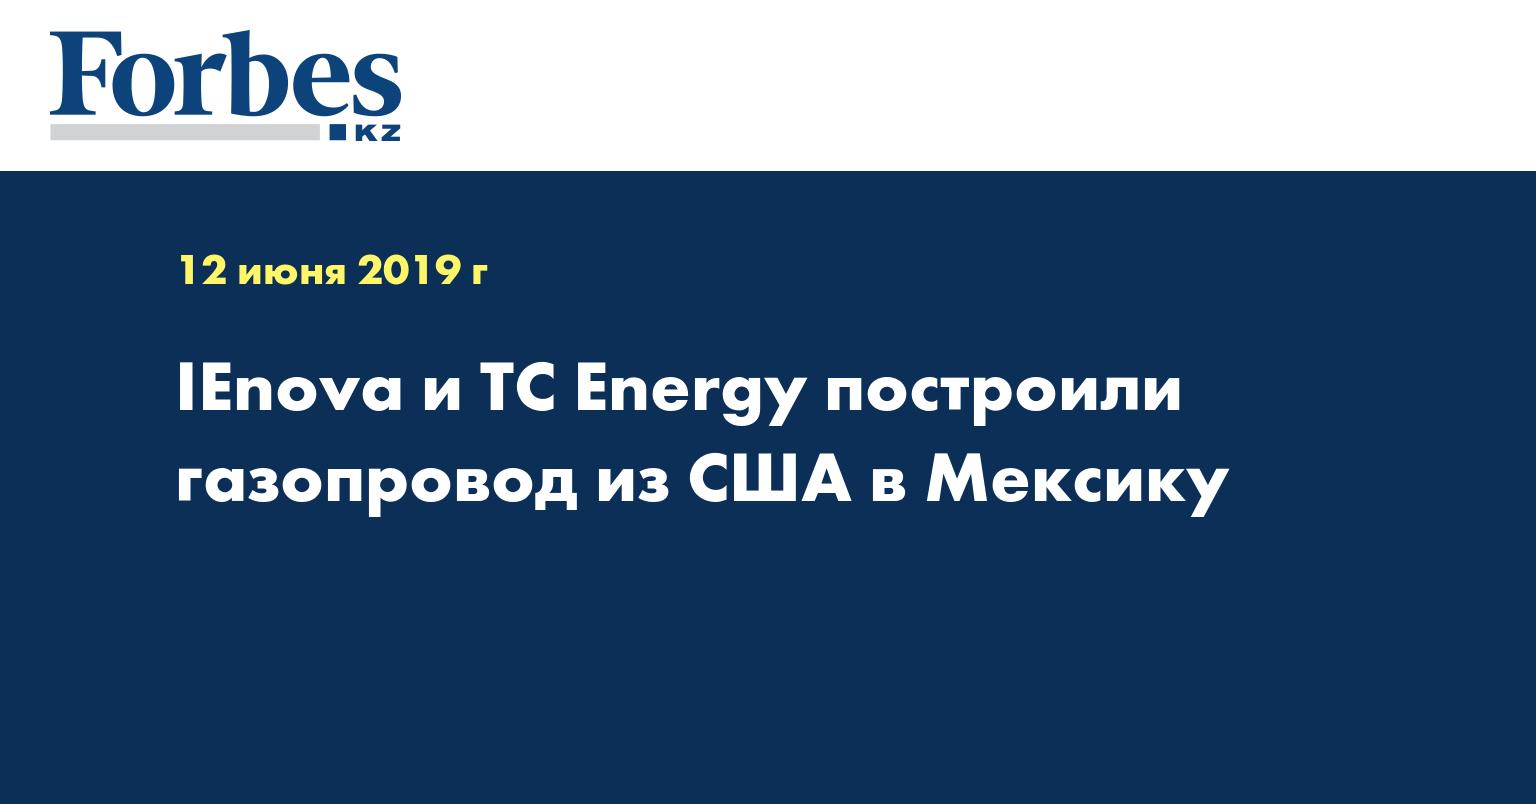 IEnova и TC Energy построили газопровод из США в Мексику